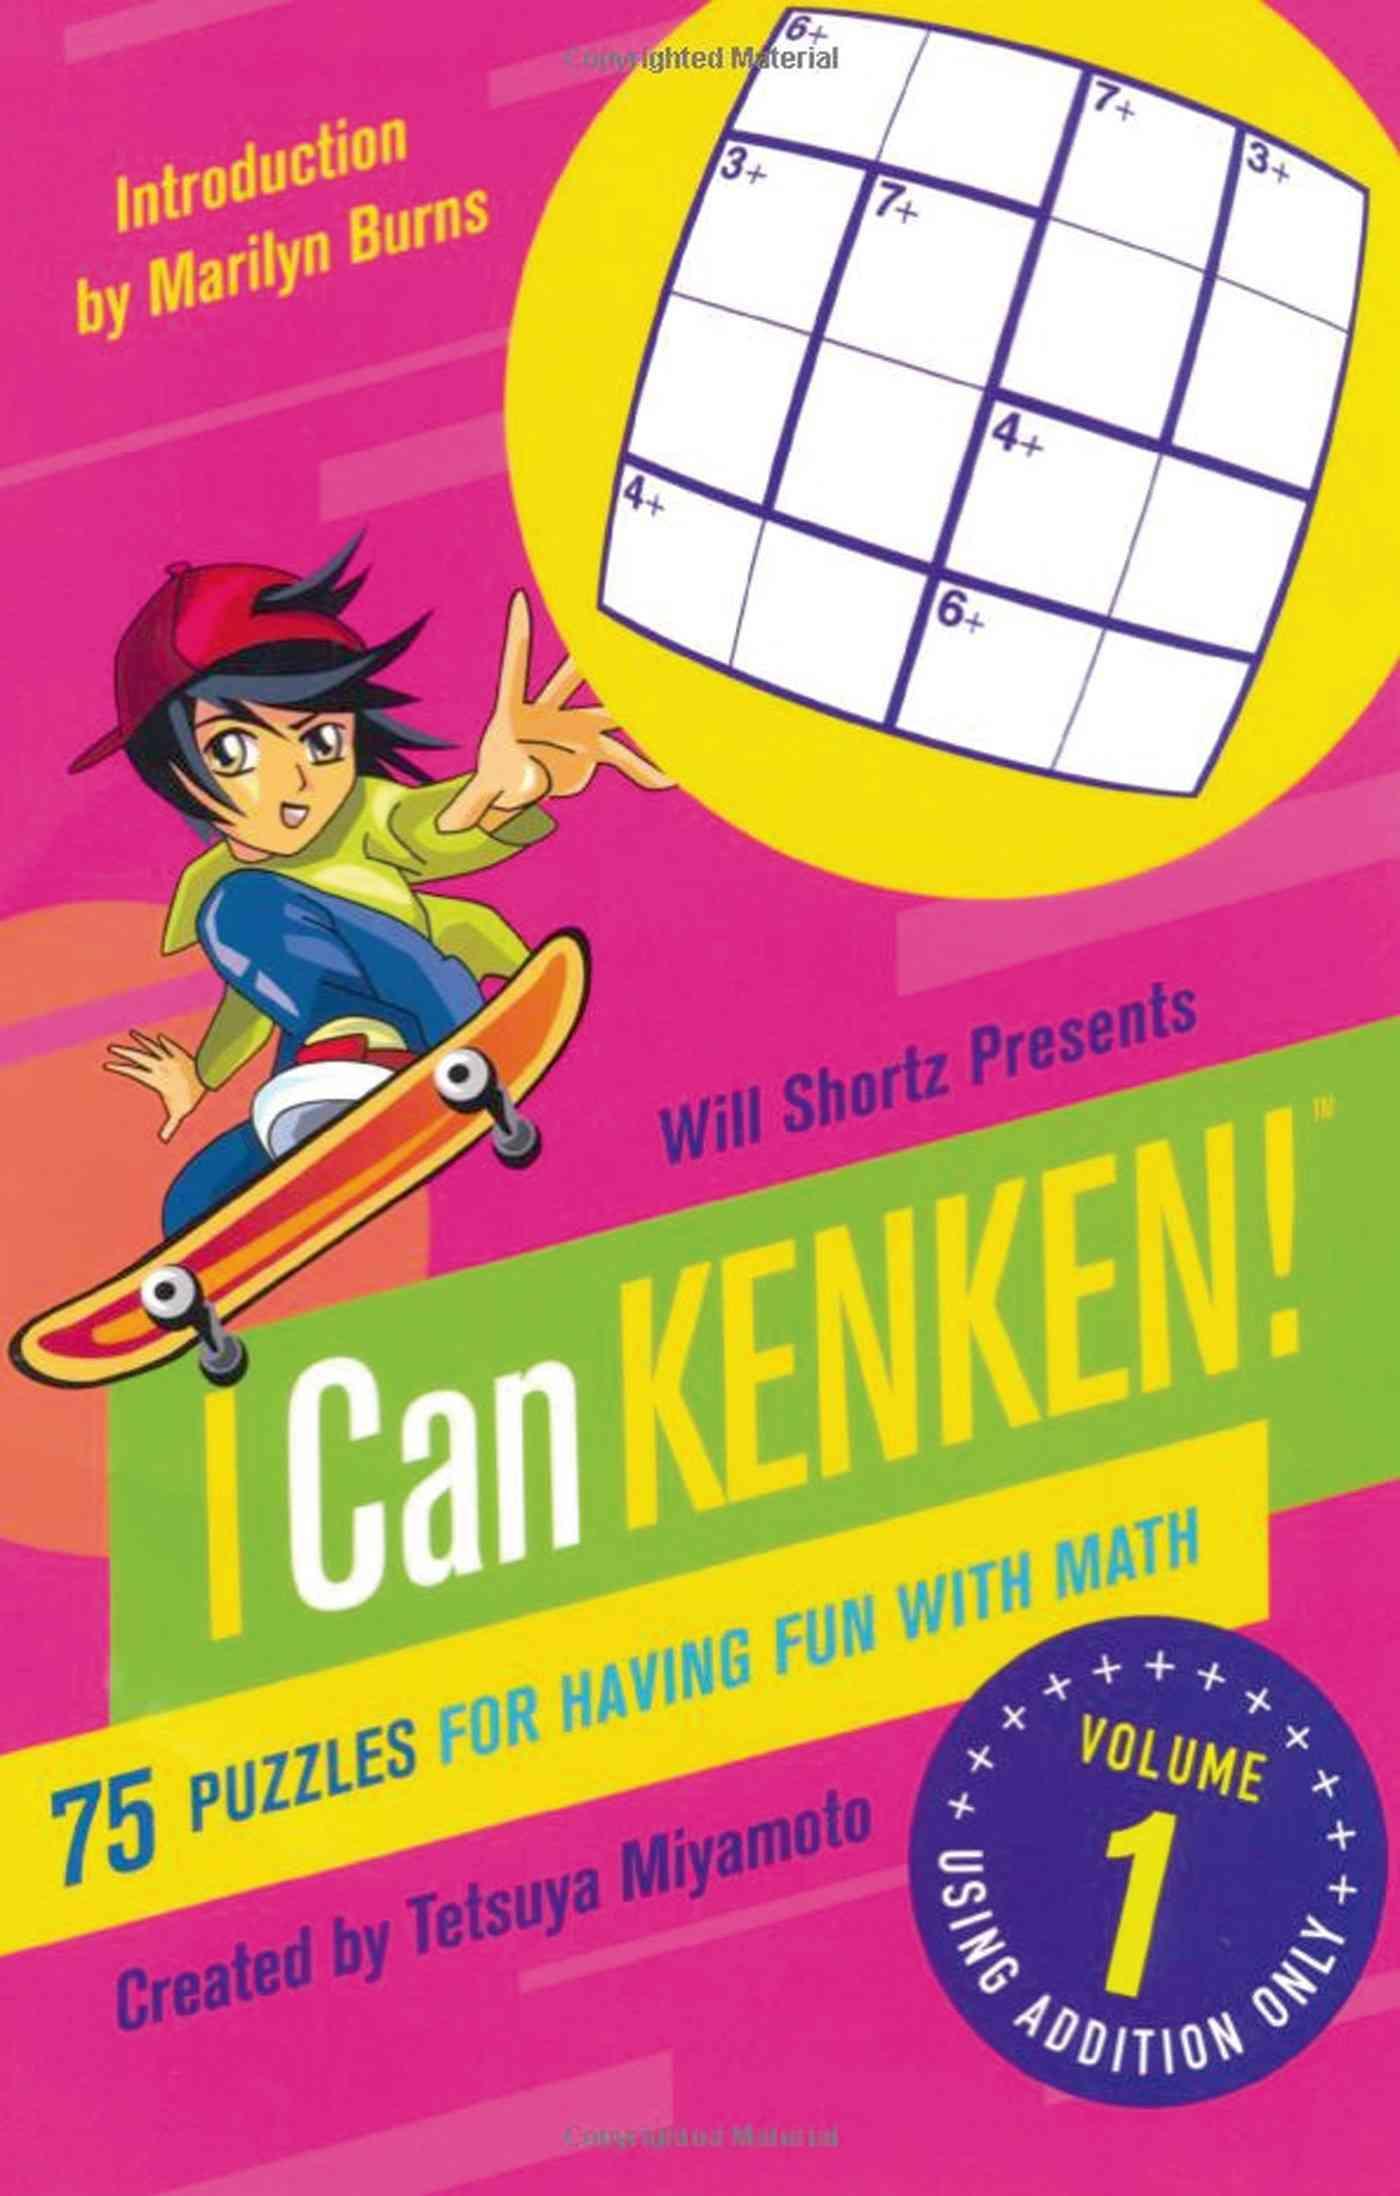 Will Shortz Presents I Can KenKen! By Miyamoto, Tetsuya/ Burns, Marilyn (INT)